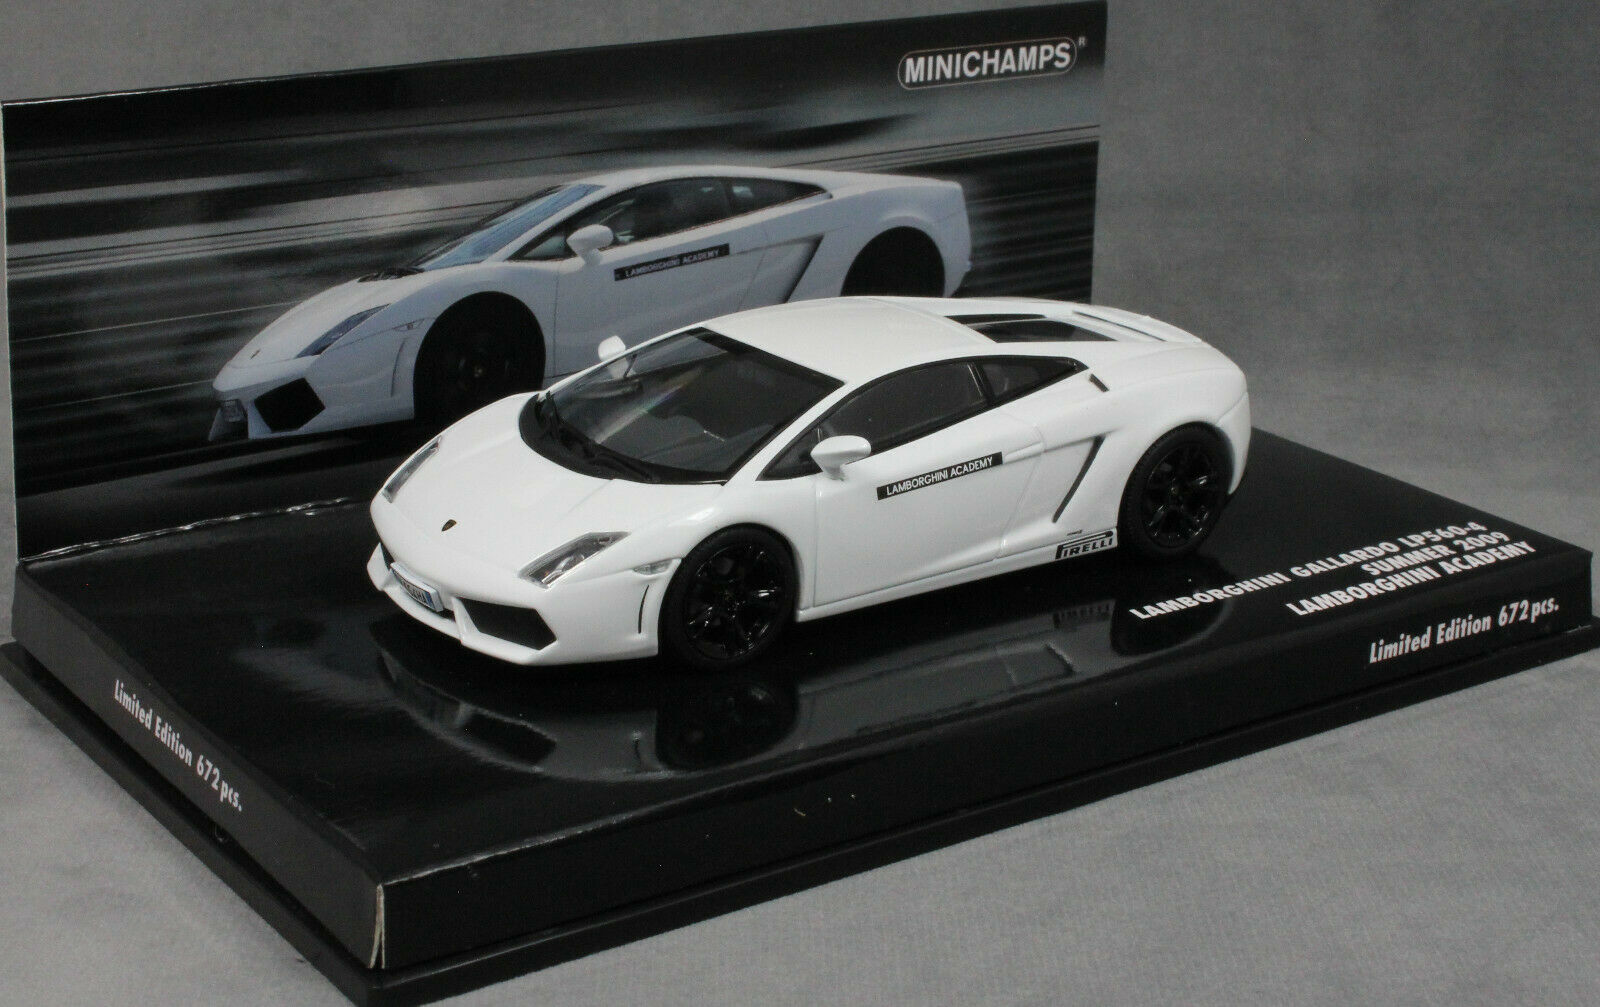 Minichamps Lamborghini Lamborghini Lamborghini Gallardo LP560-4 Lamborghini Academy in White 436103801 b2f086